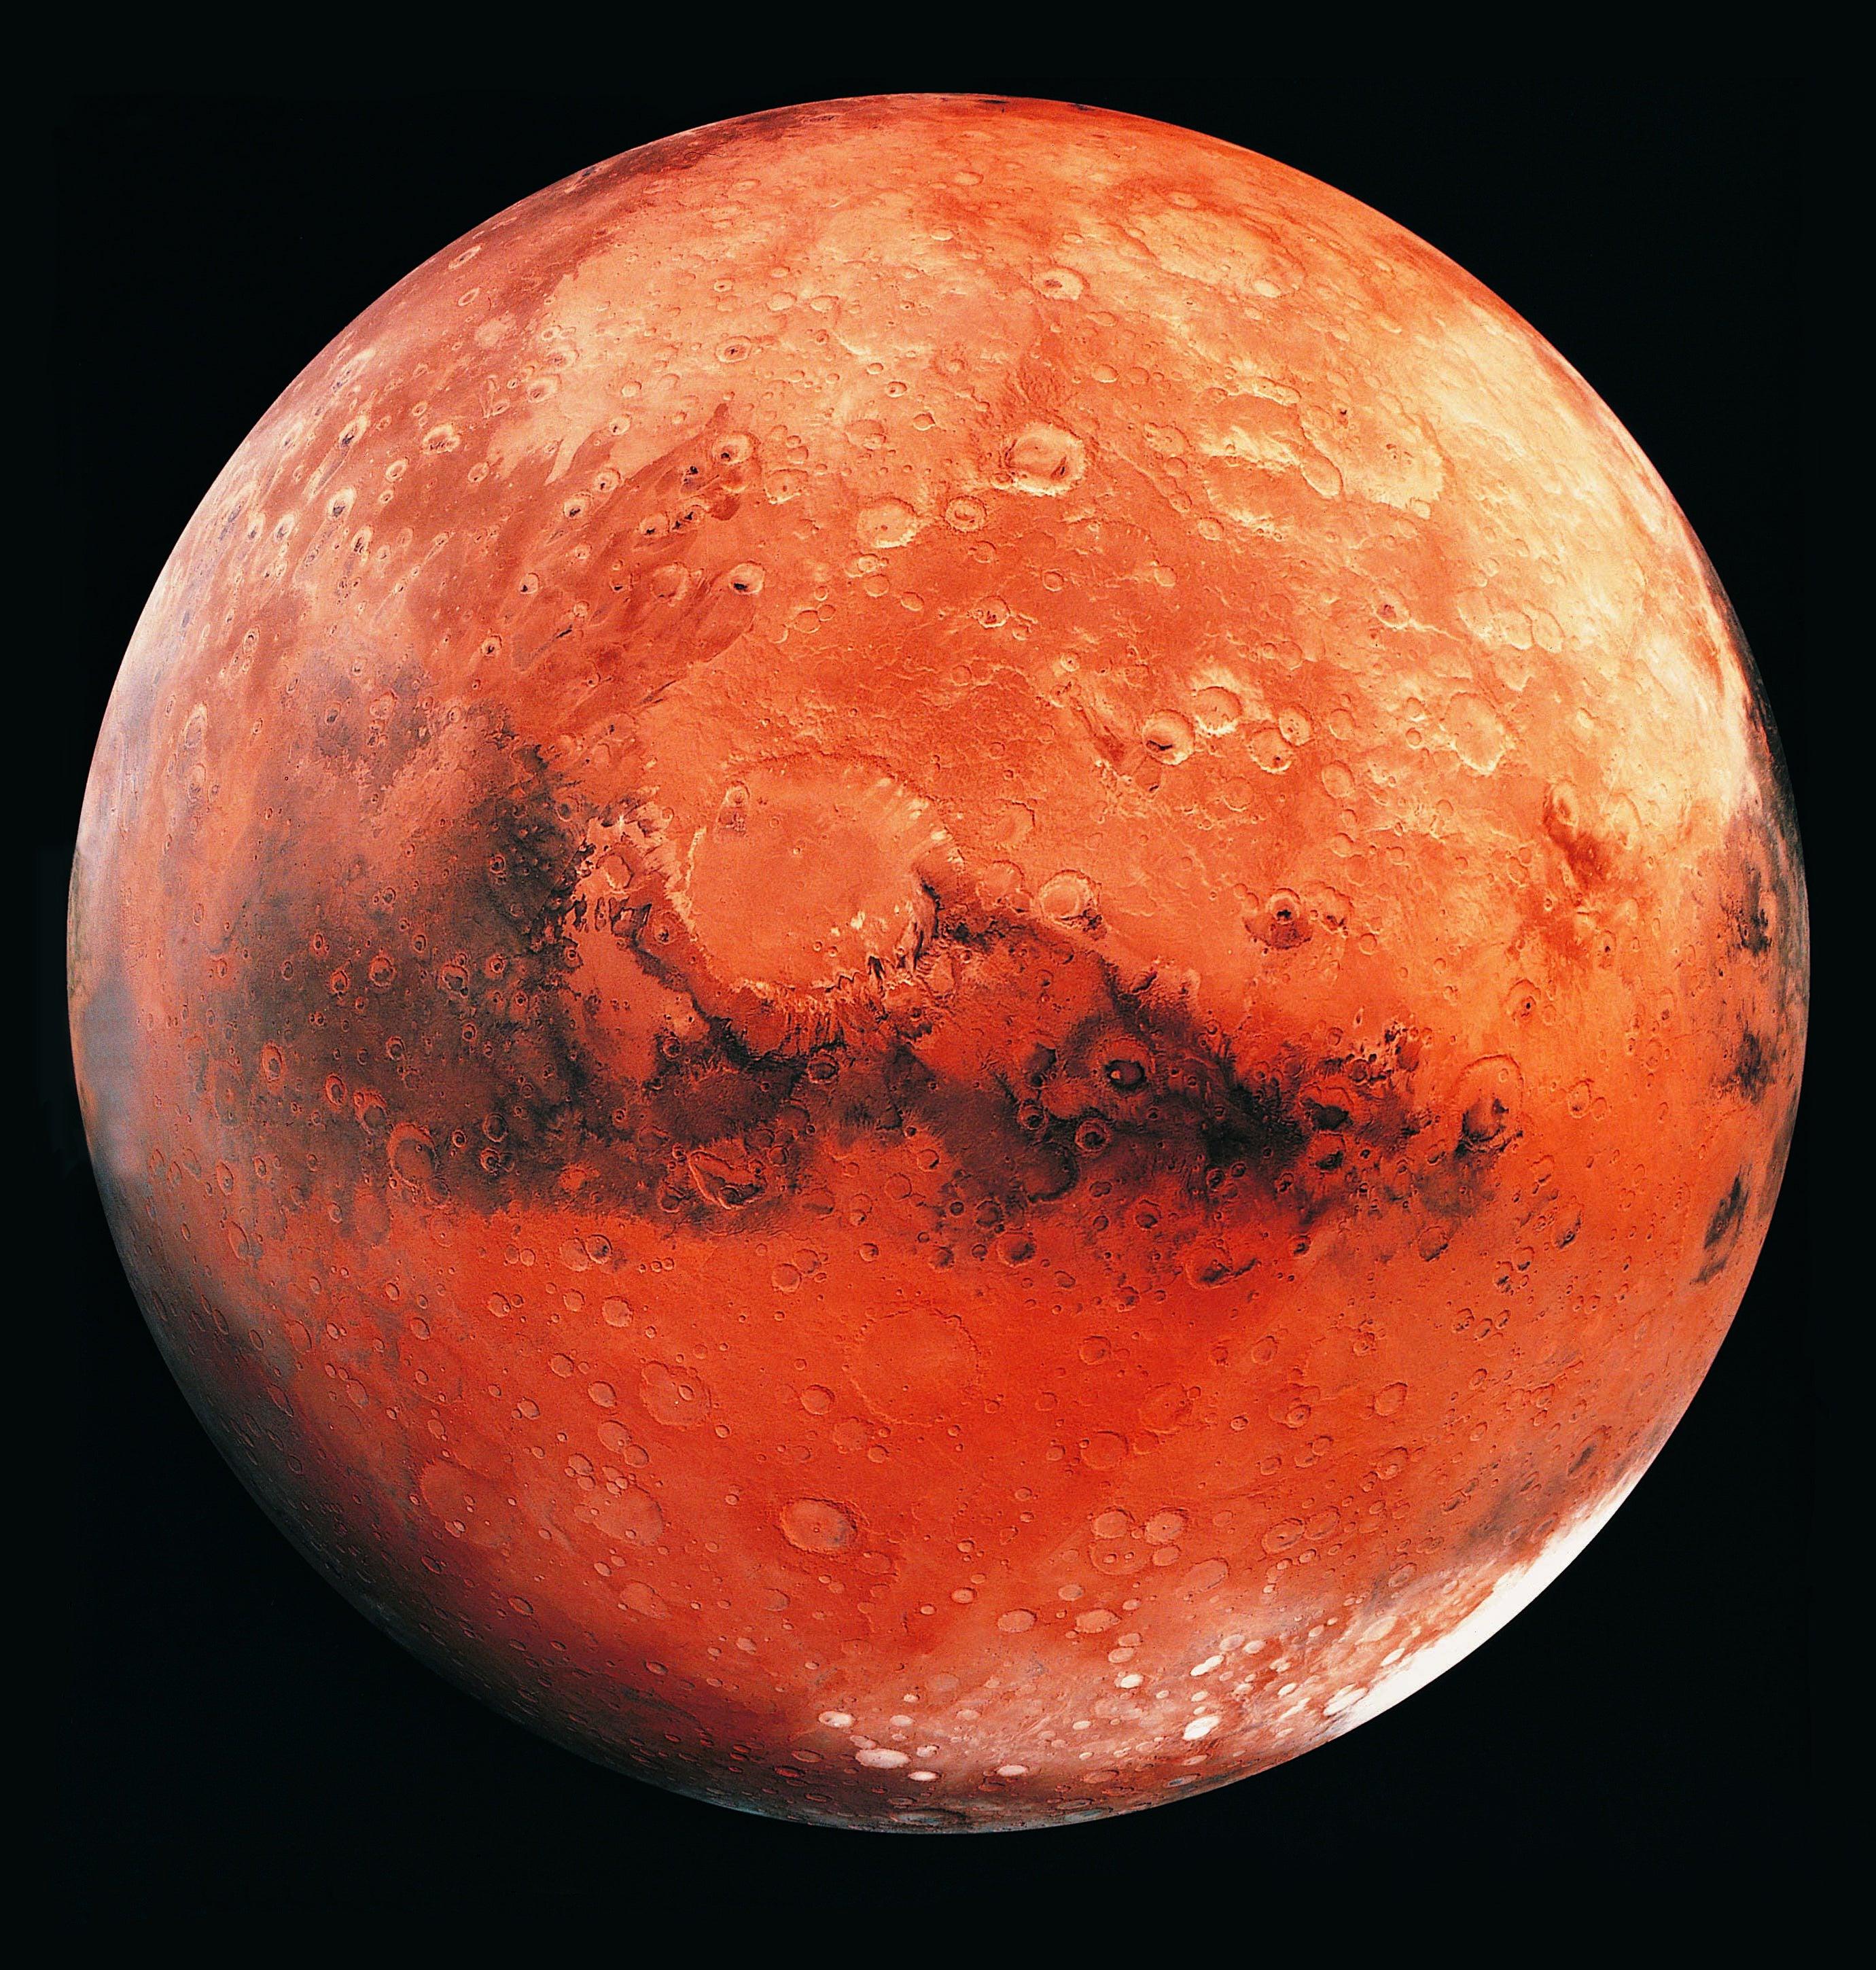 Mars Lander Will Peer Inside the Red Planet